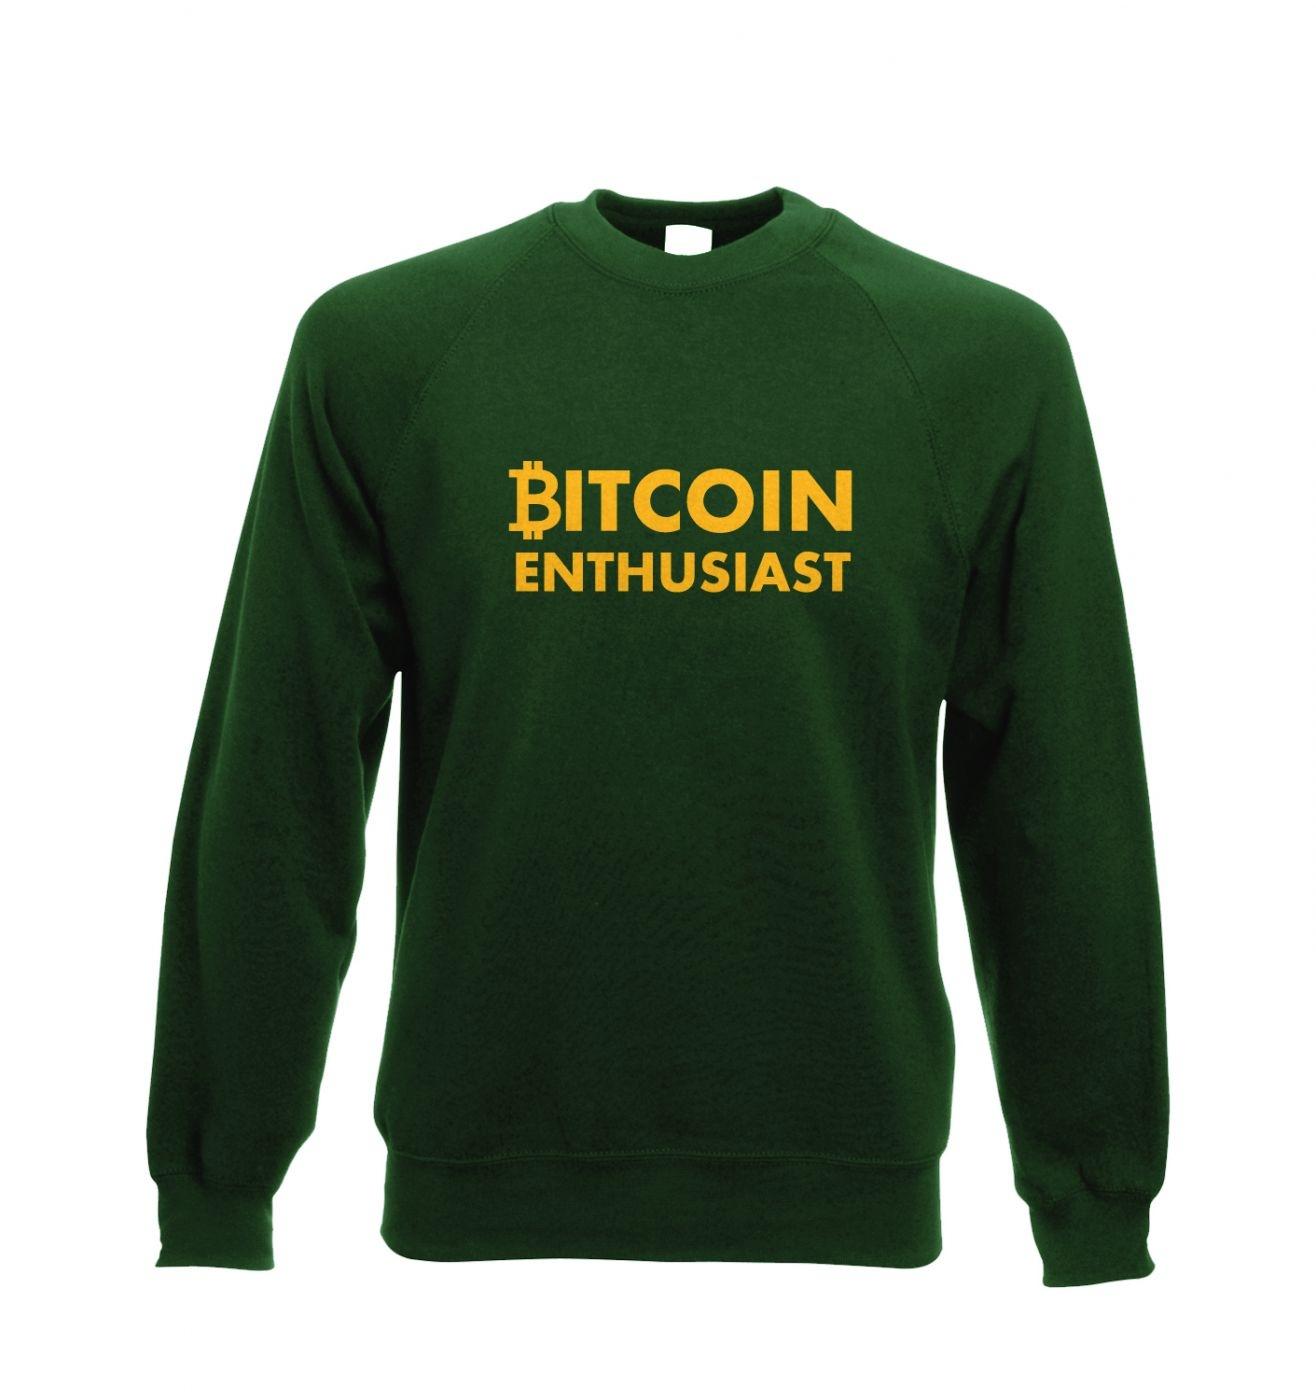 Bitcoin Enthusiast Adult Crewneck Sweatshirt